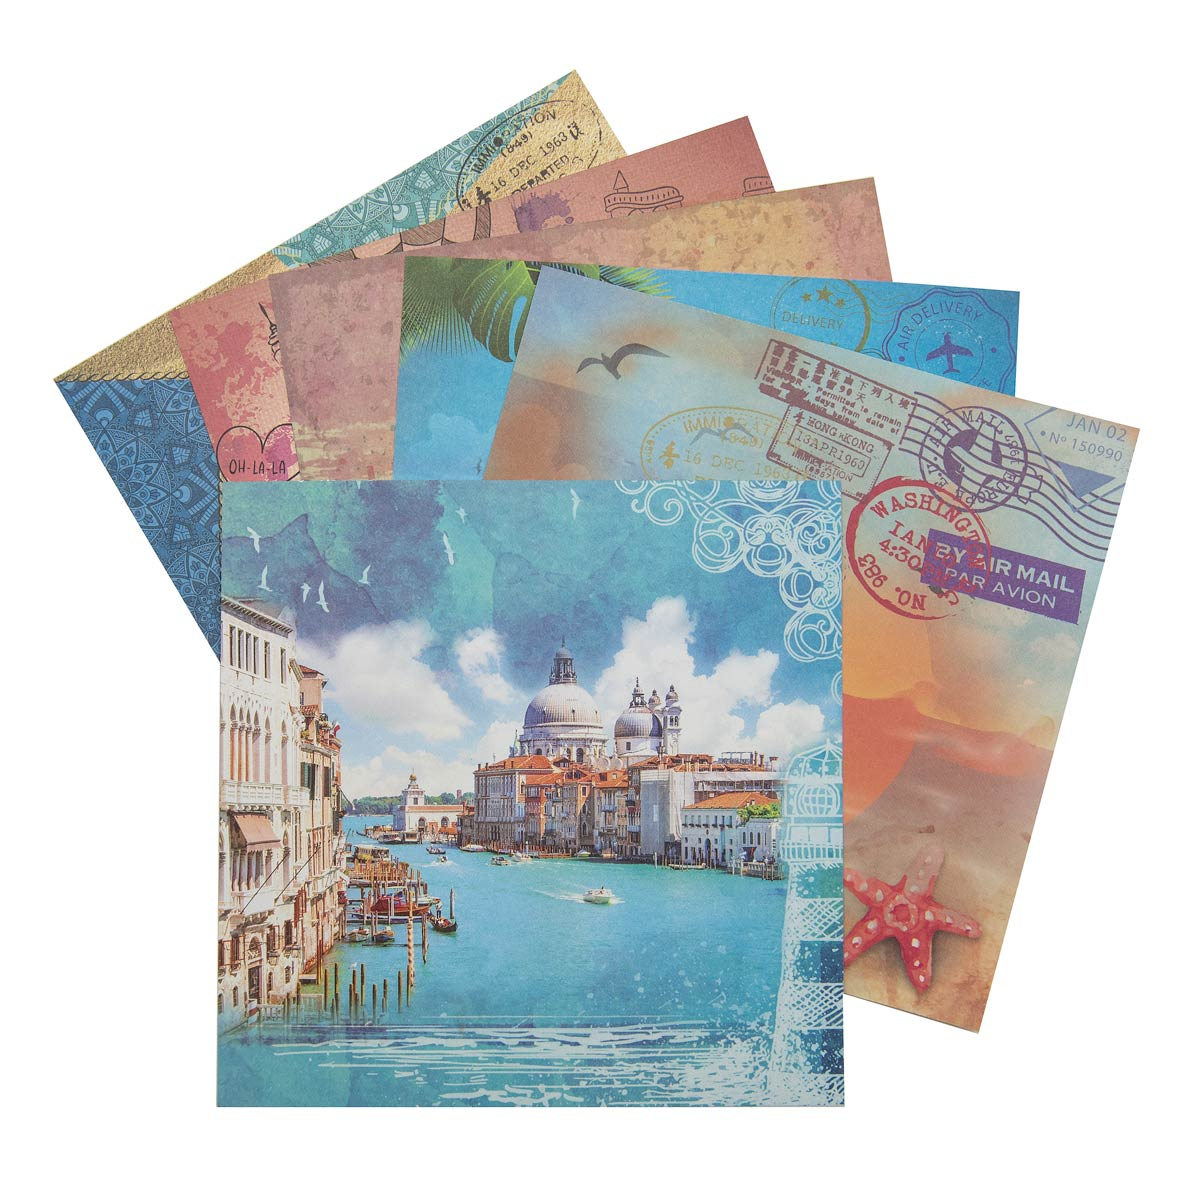 С2781-05 Цветная бумага для скрапбукинга. 6л. 15x15 'Отпуск'.